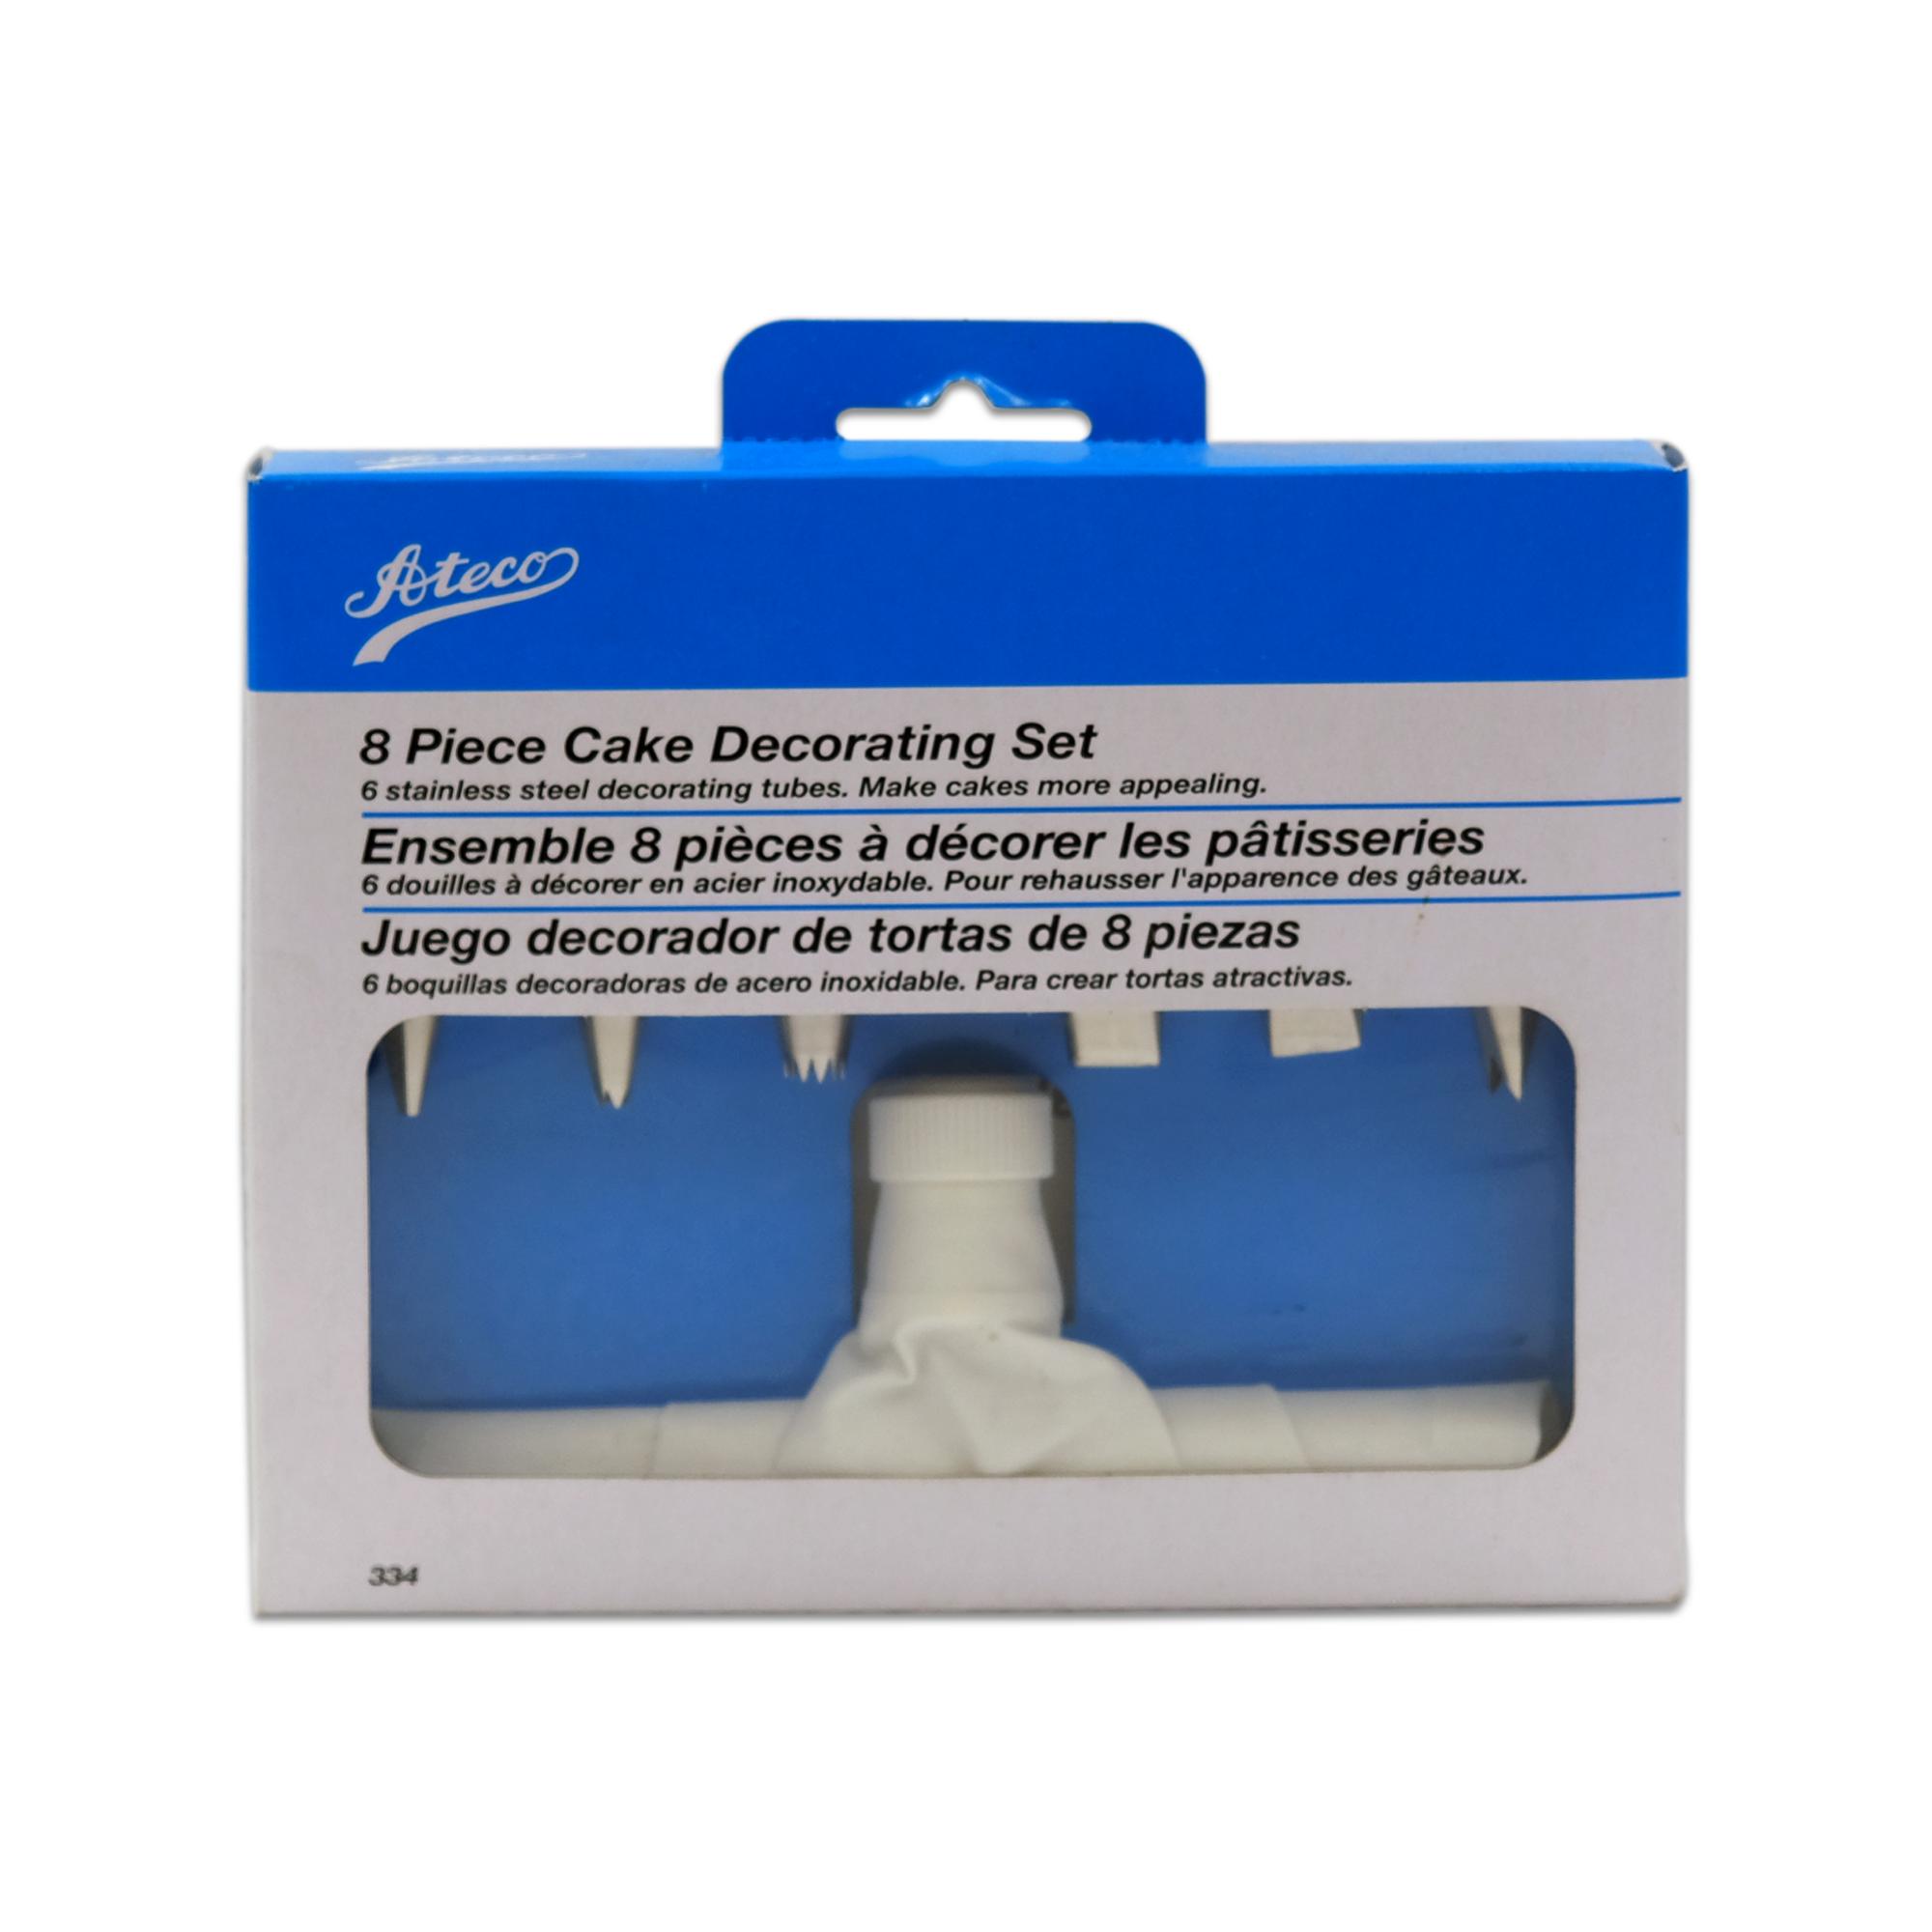 Ateco Cake Decorating Set Couplers and Decorating Tubes Decorating Bag